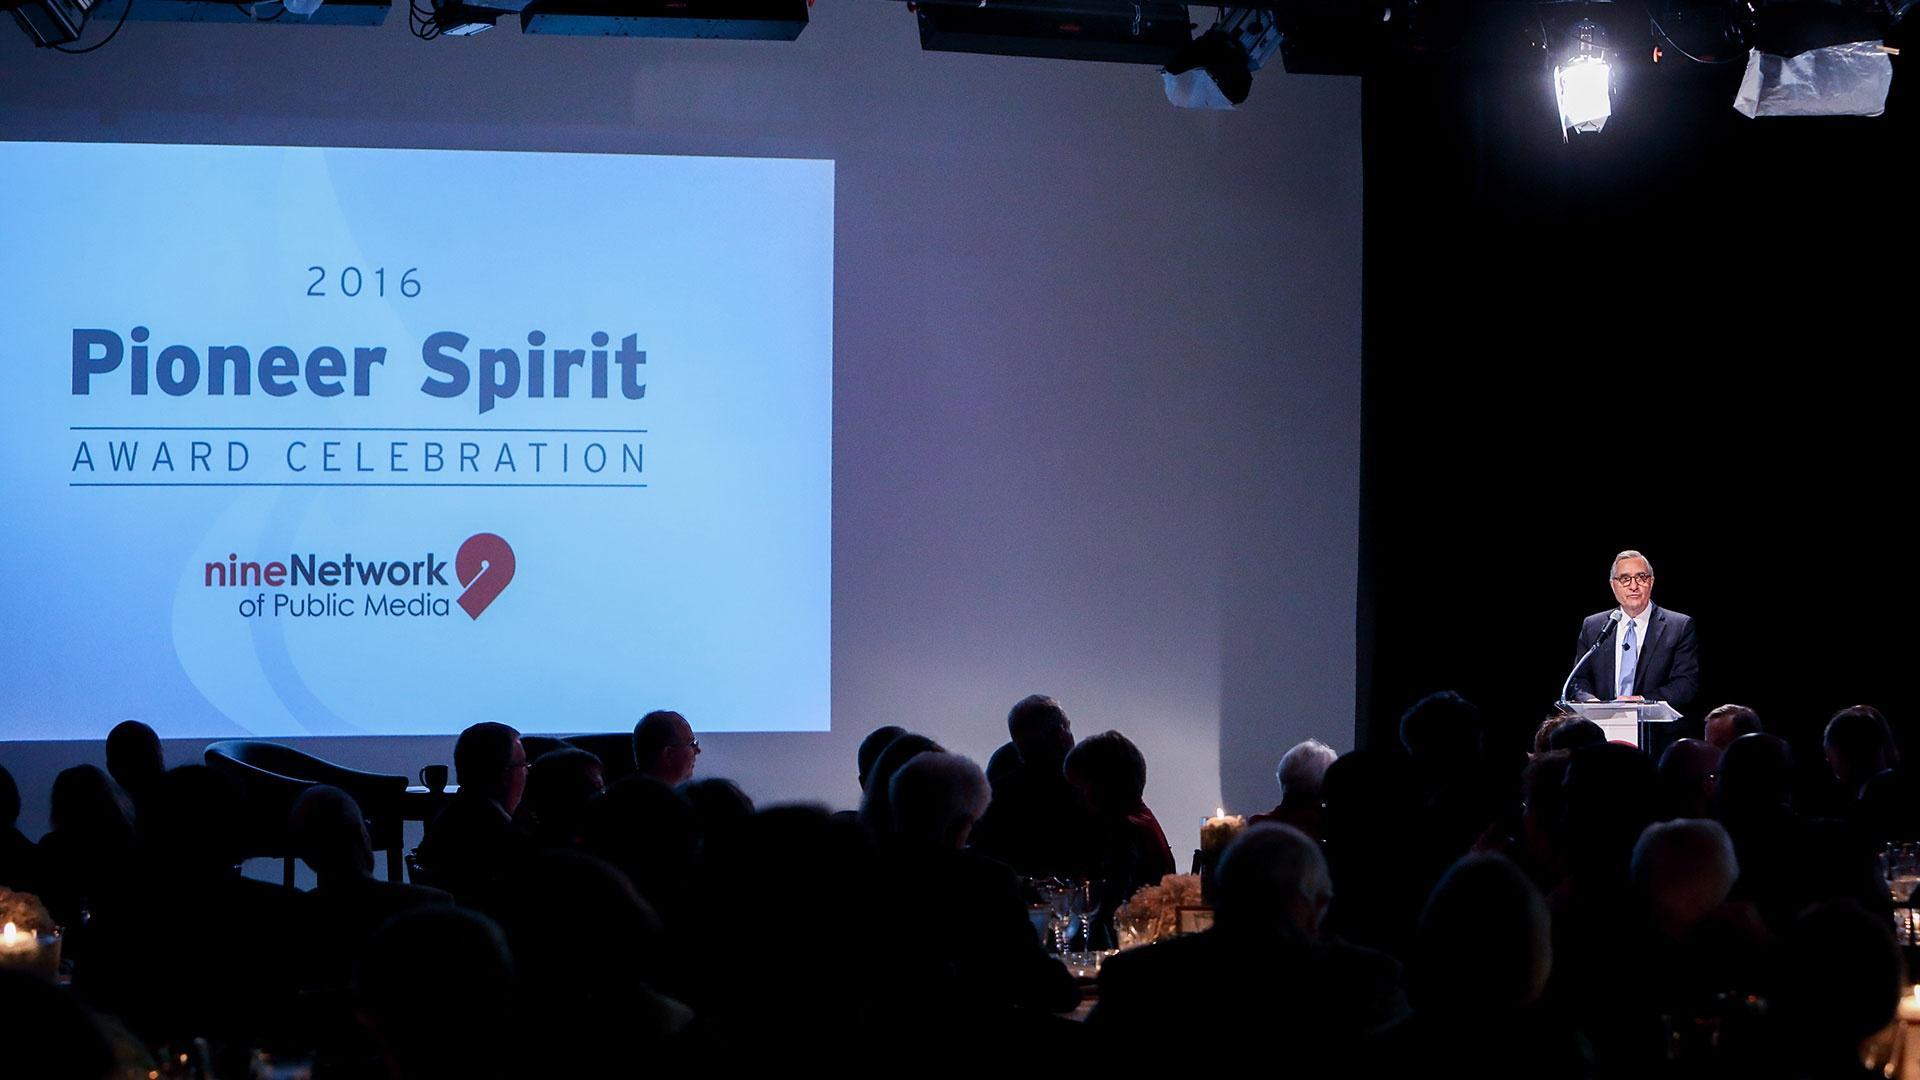 2016 Pioneer Spirit Award Celebration